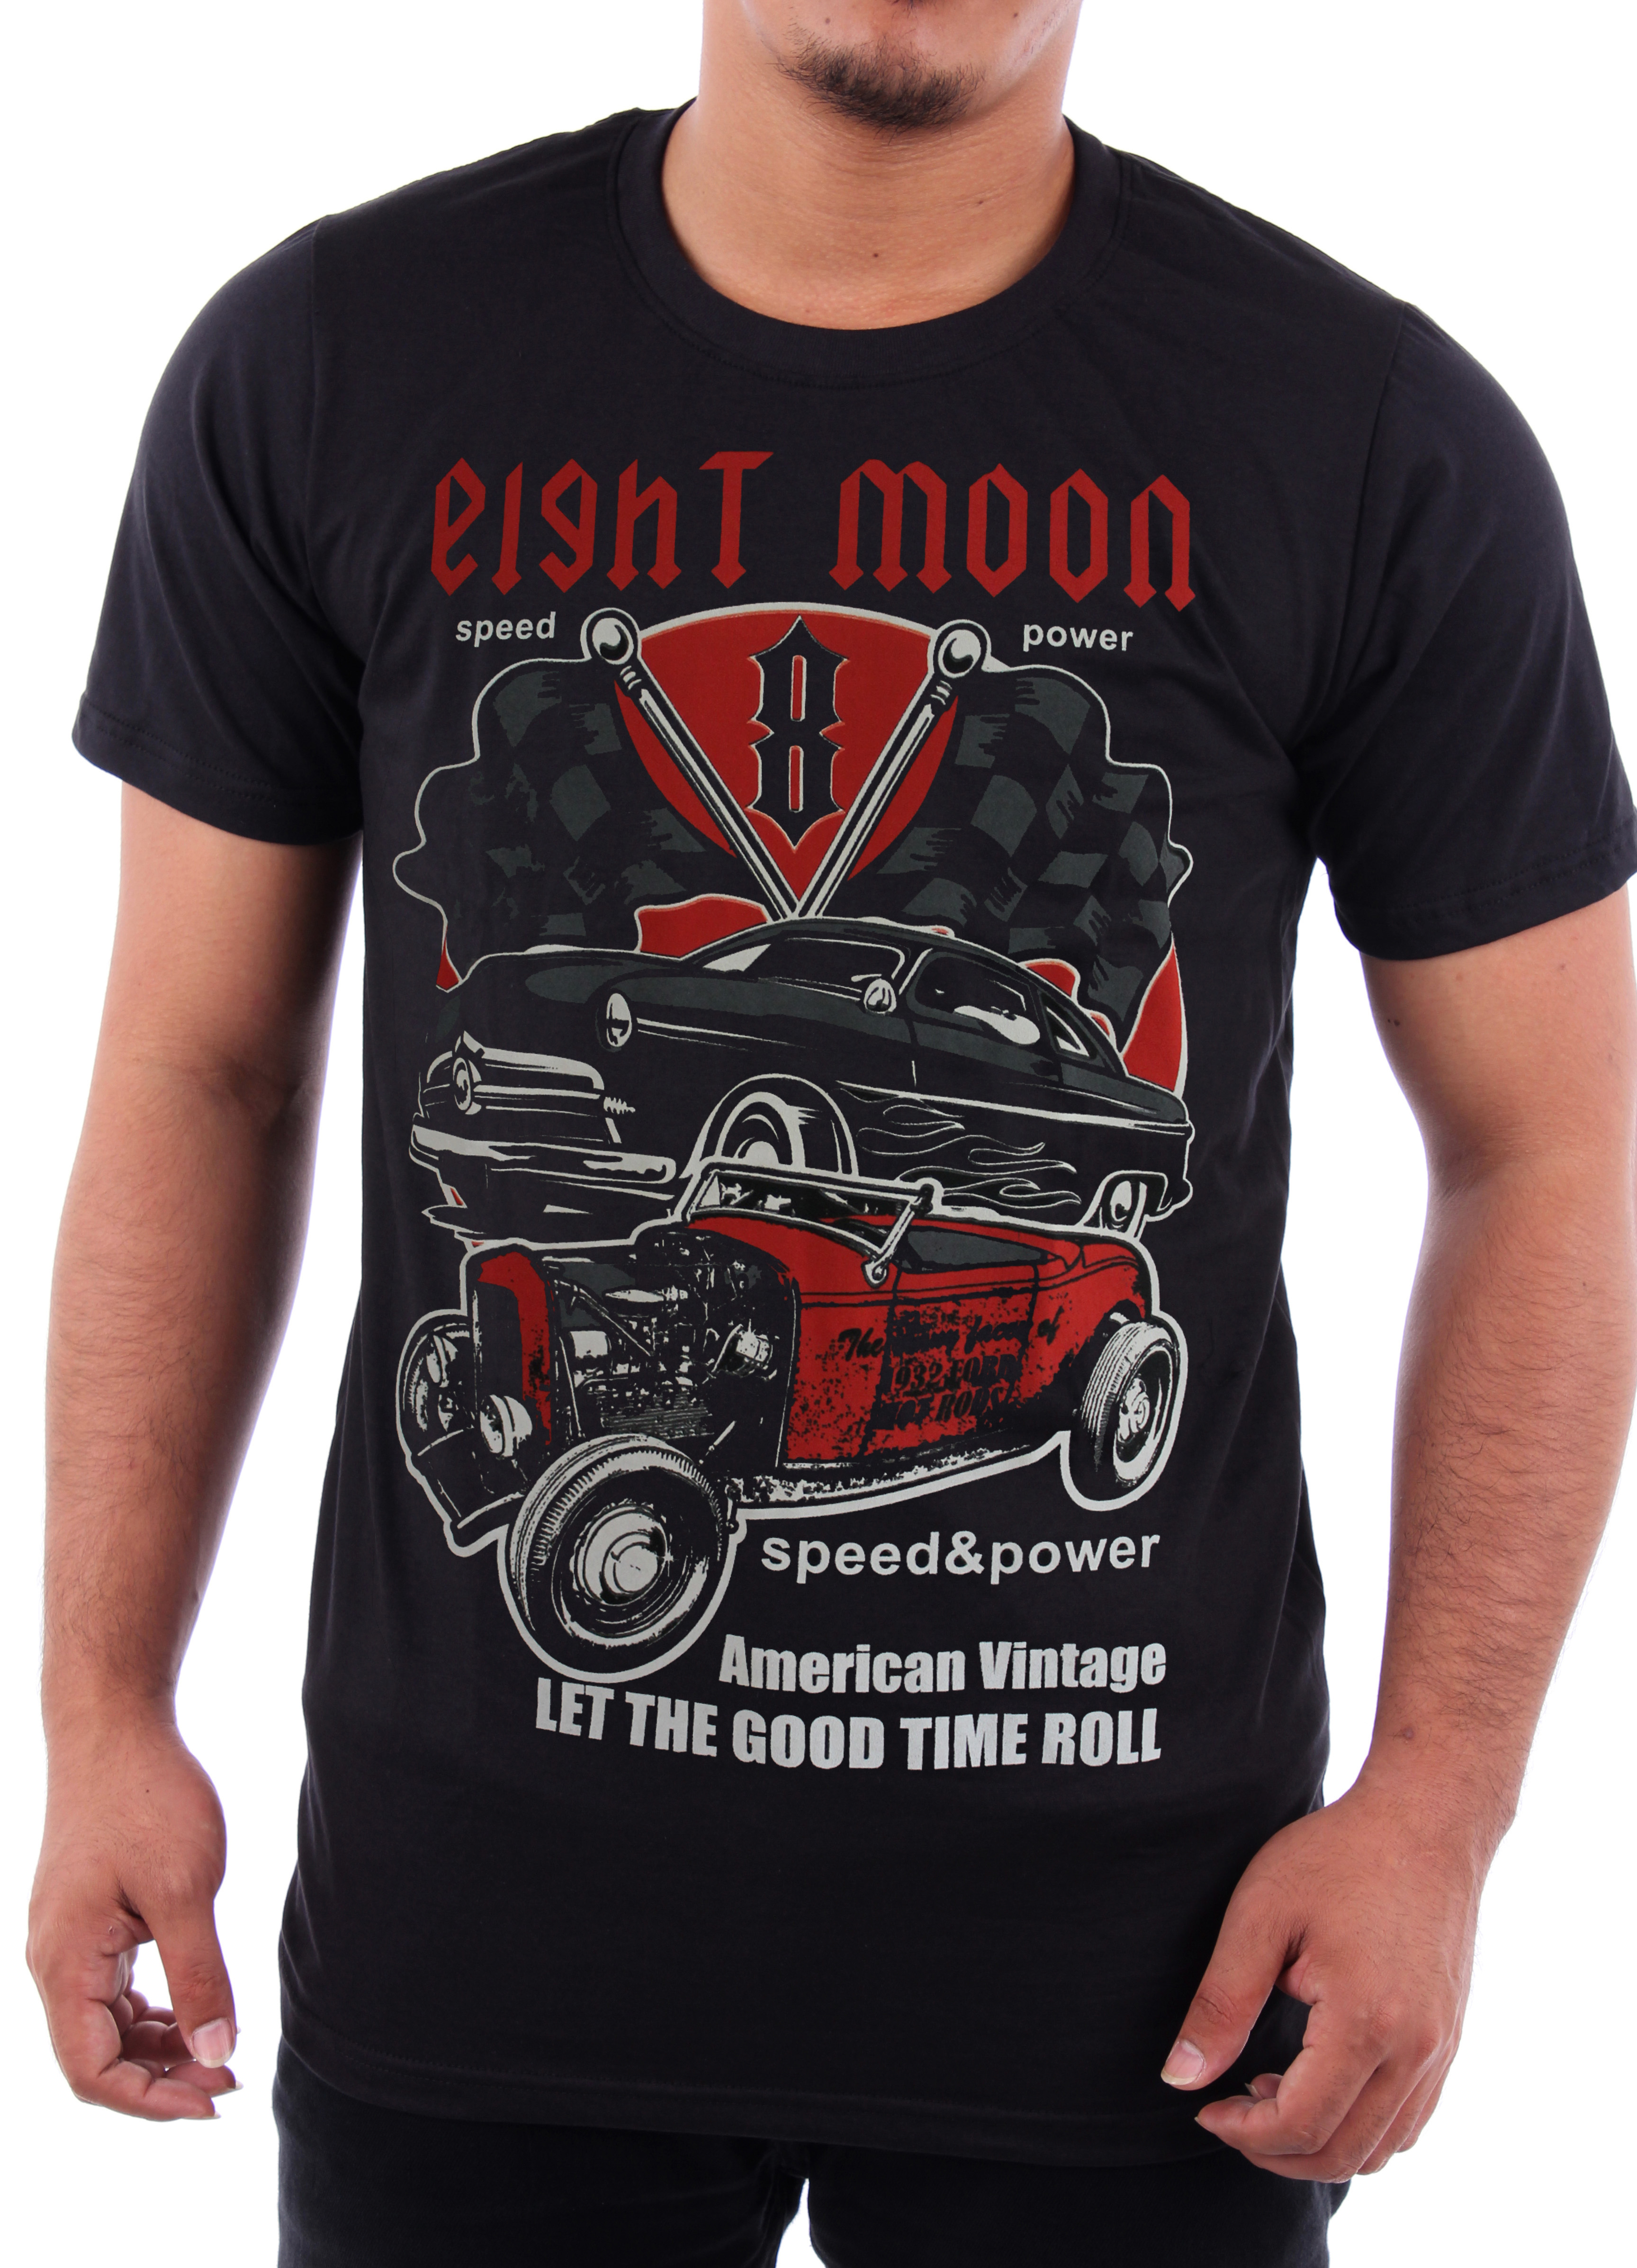 eight_moon_rockabilly_mens_shirt_custom_cars_hot_rod_rocker_en10_t_shirts_4.jpg